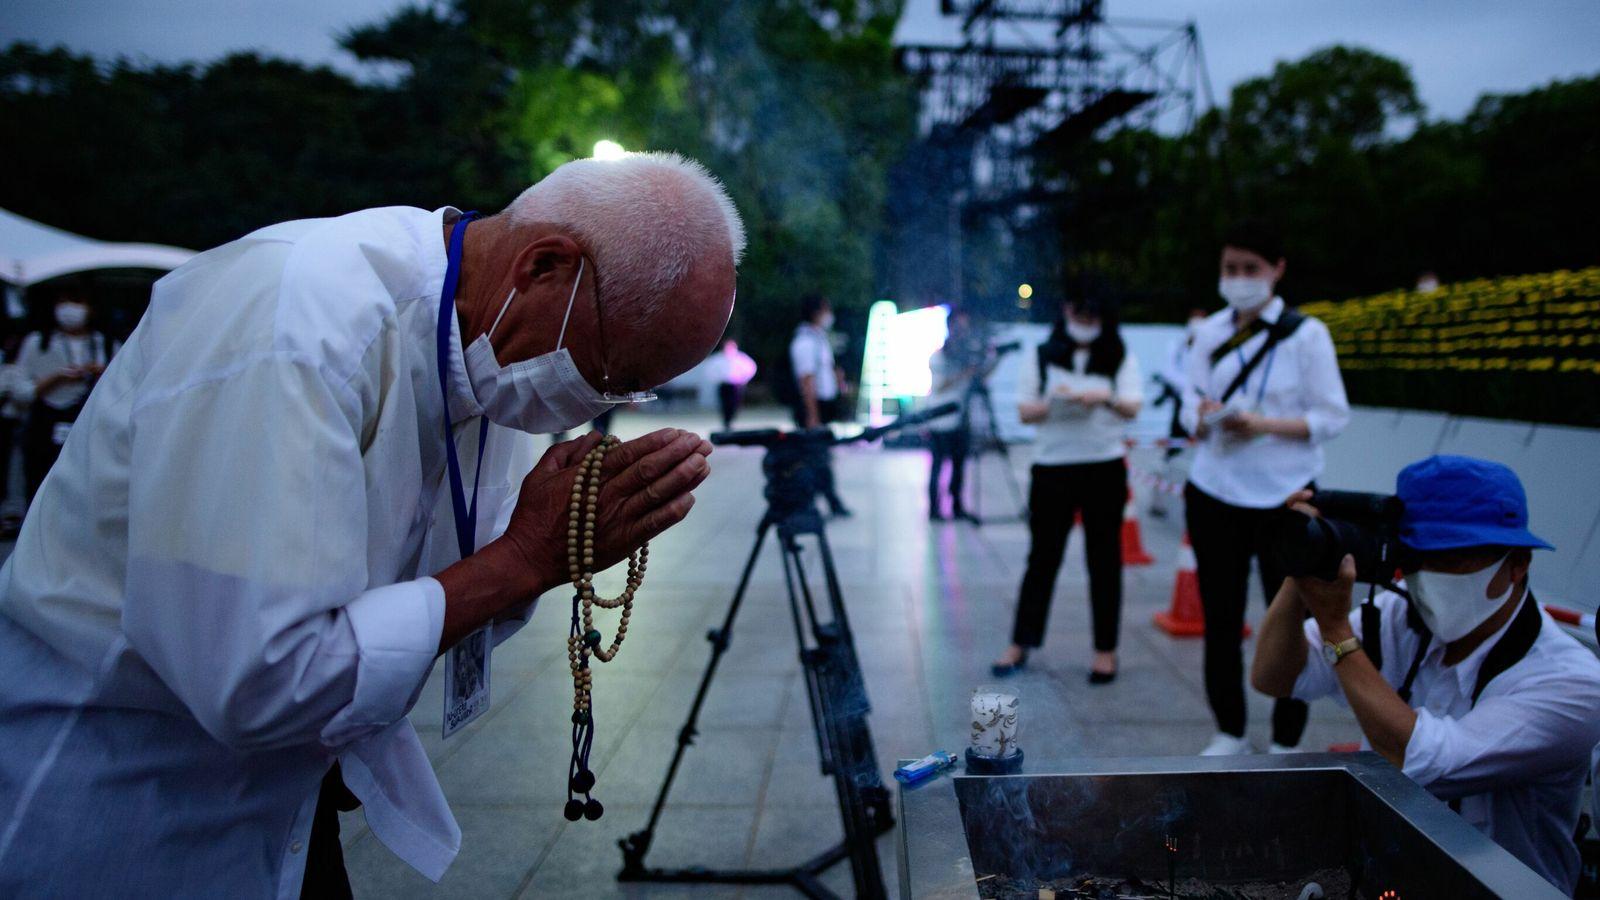 Dwindling band of survivors marks 75th anniversary of the Hiroshima atomic bomb